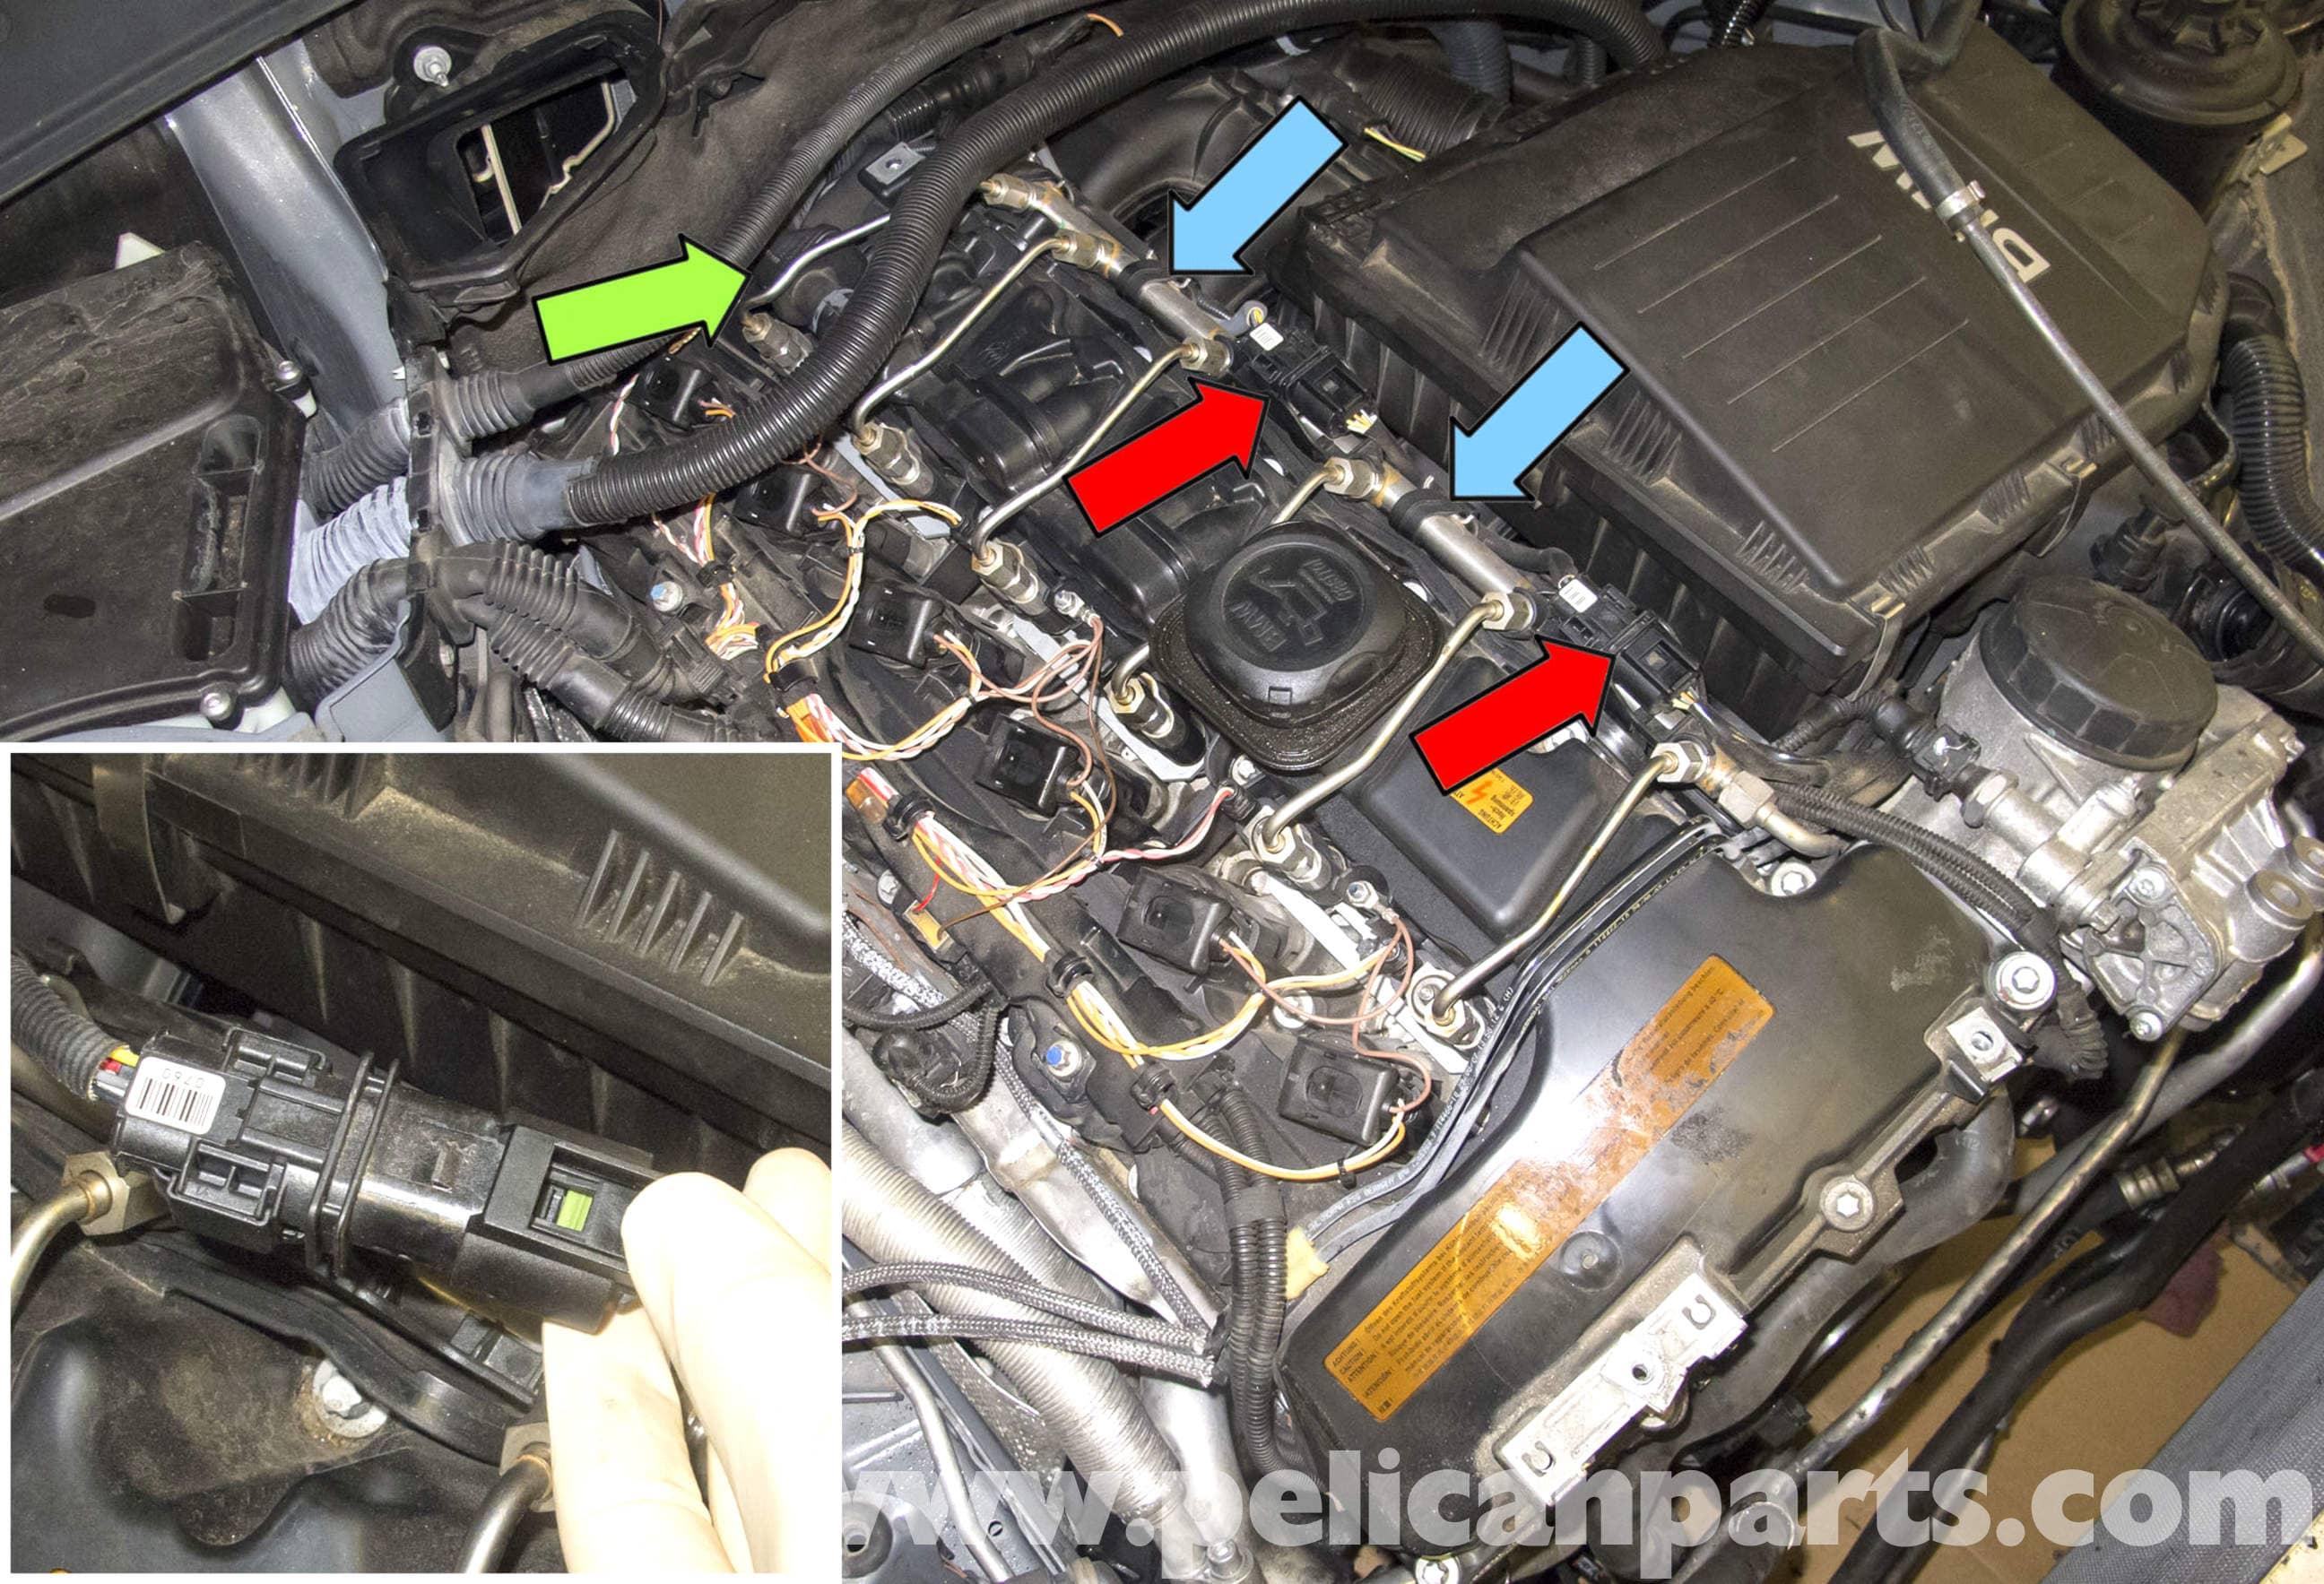 Bmw E46 Maf Sensor Wiring Harness 33 Diagram Images E36 Pic05 Sensors Diagrams Engine Mercedes